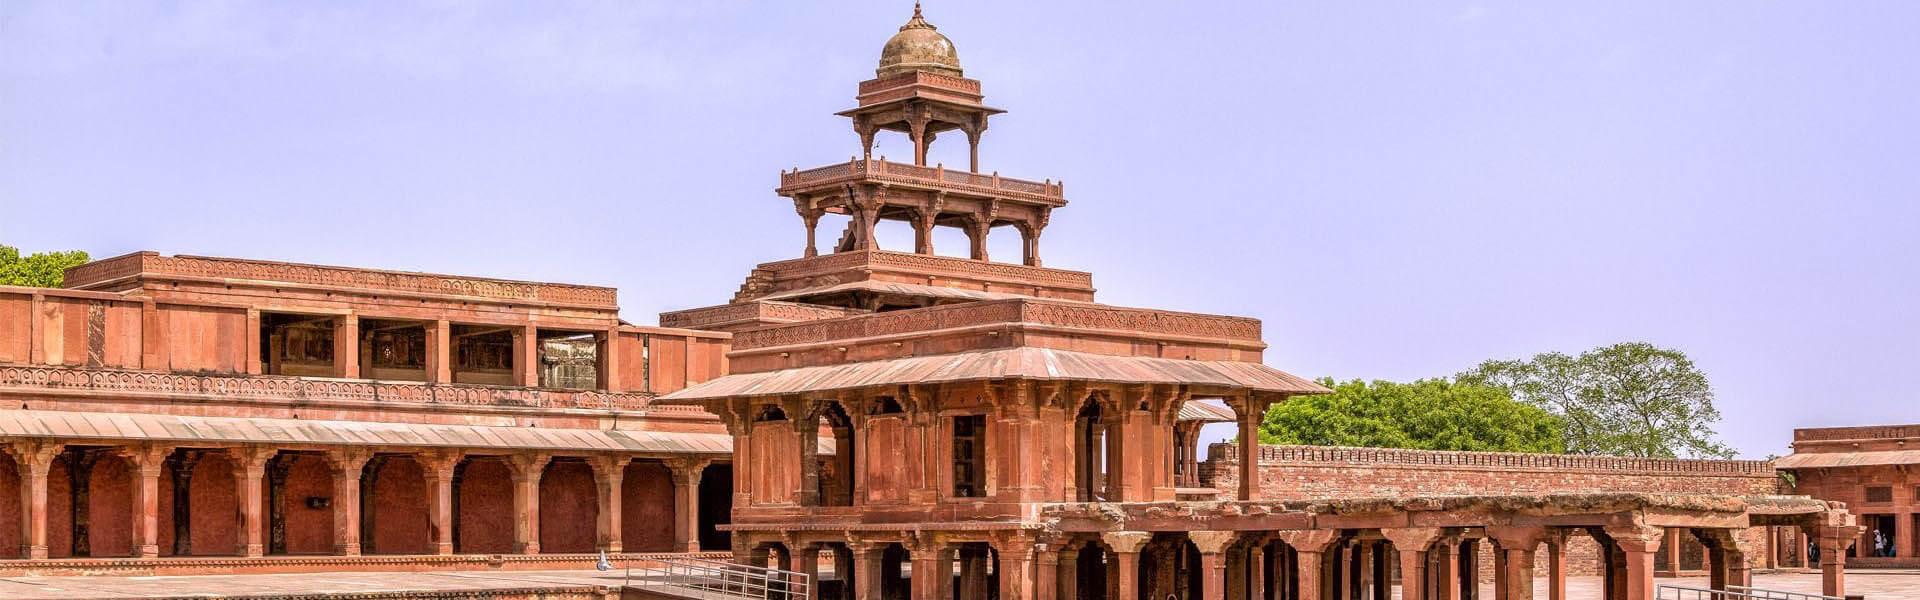 Agra & Fatehpur Sikri, india tour